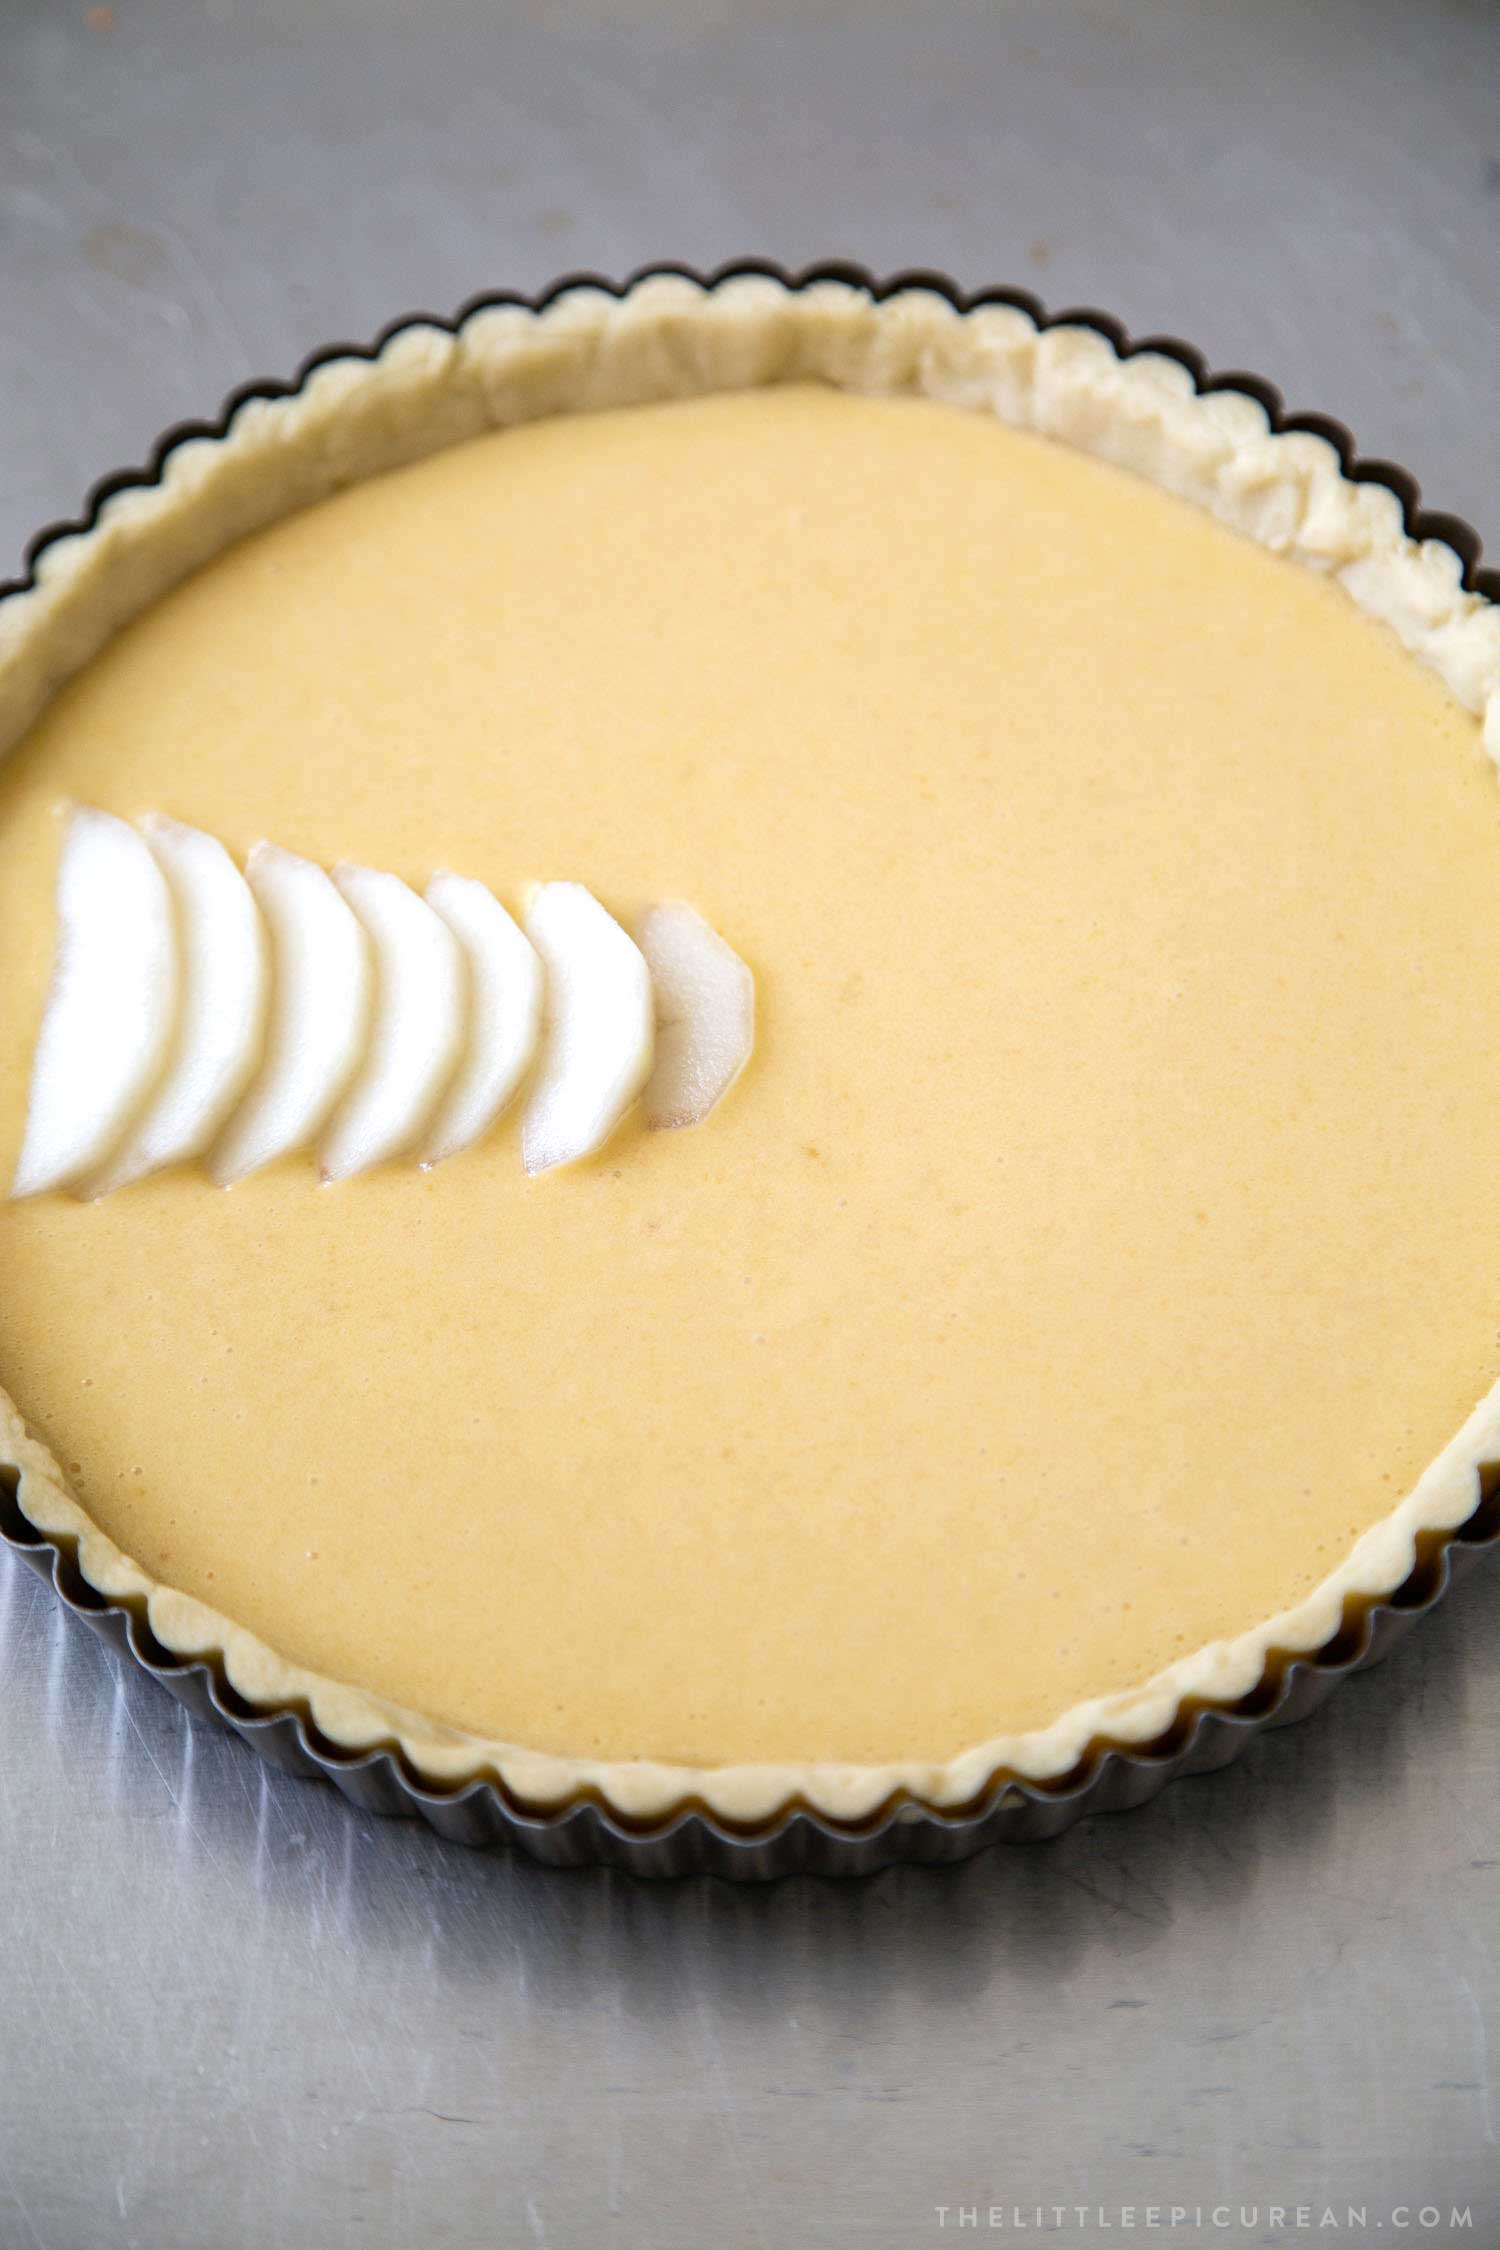 Pear Frangipane Tart. Pour homemade frangipane filling into par-baked tart shell. Then, arrange sliced pears and almonds on top.